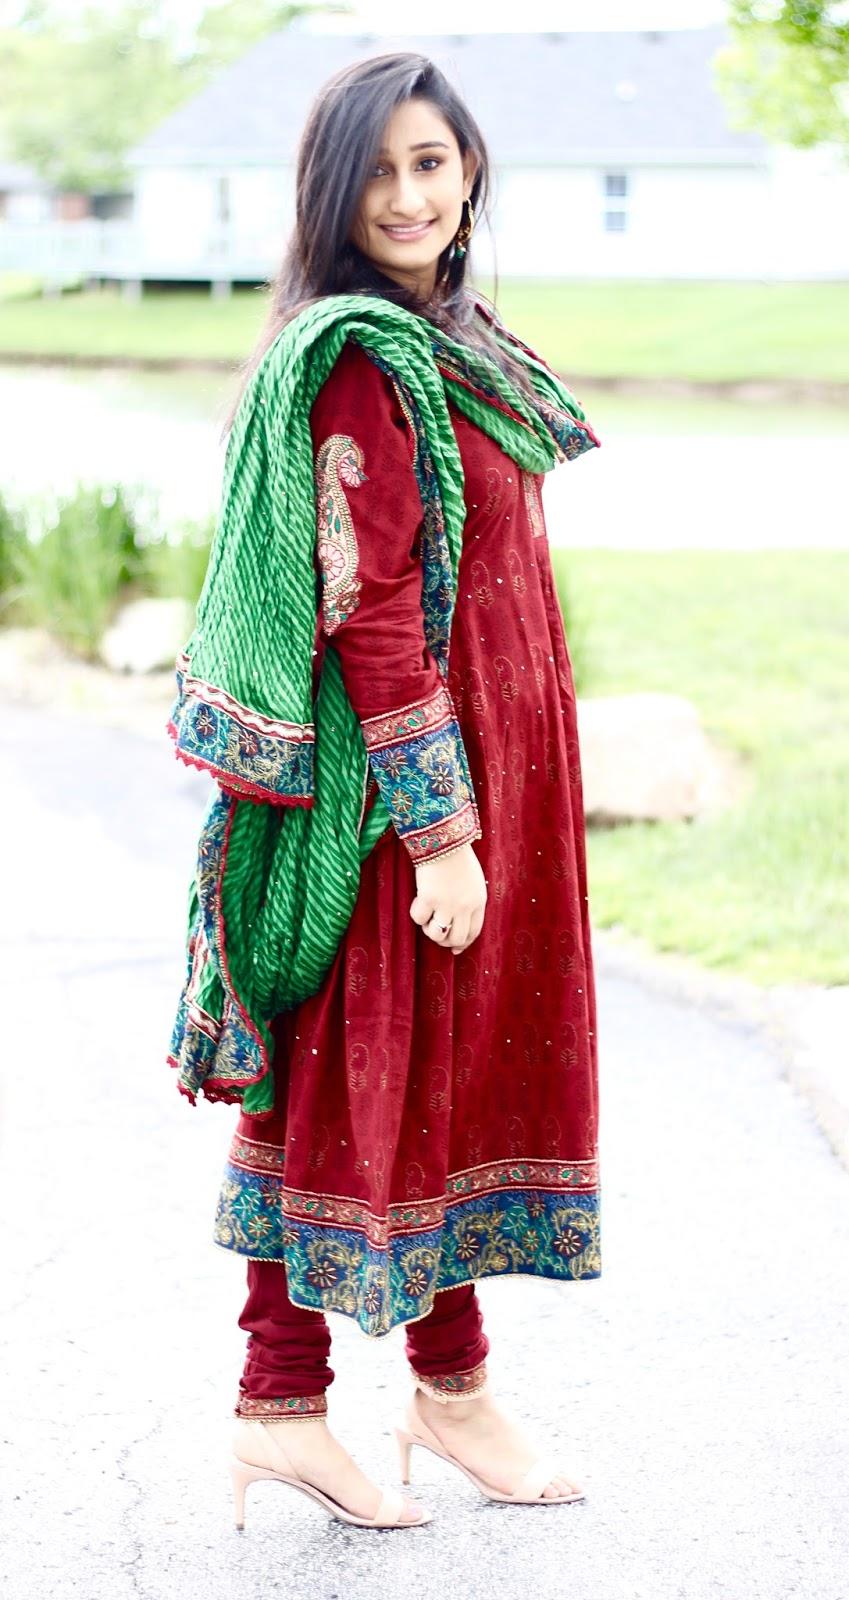 indian wedding grwm ootd beauty detour